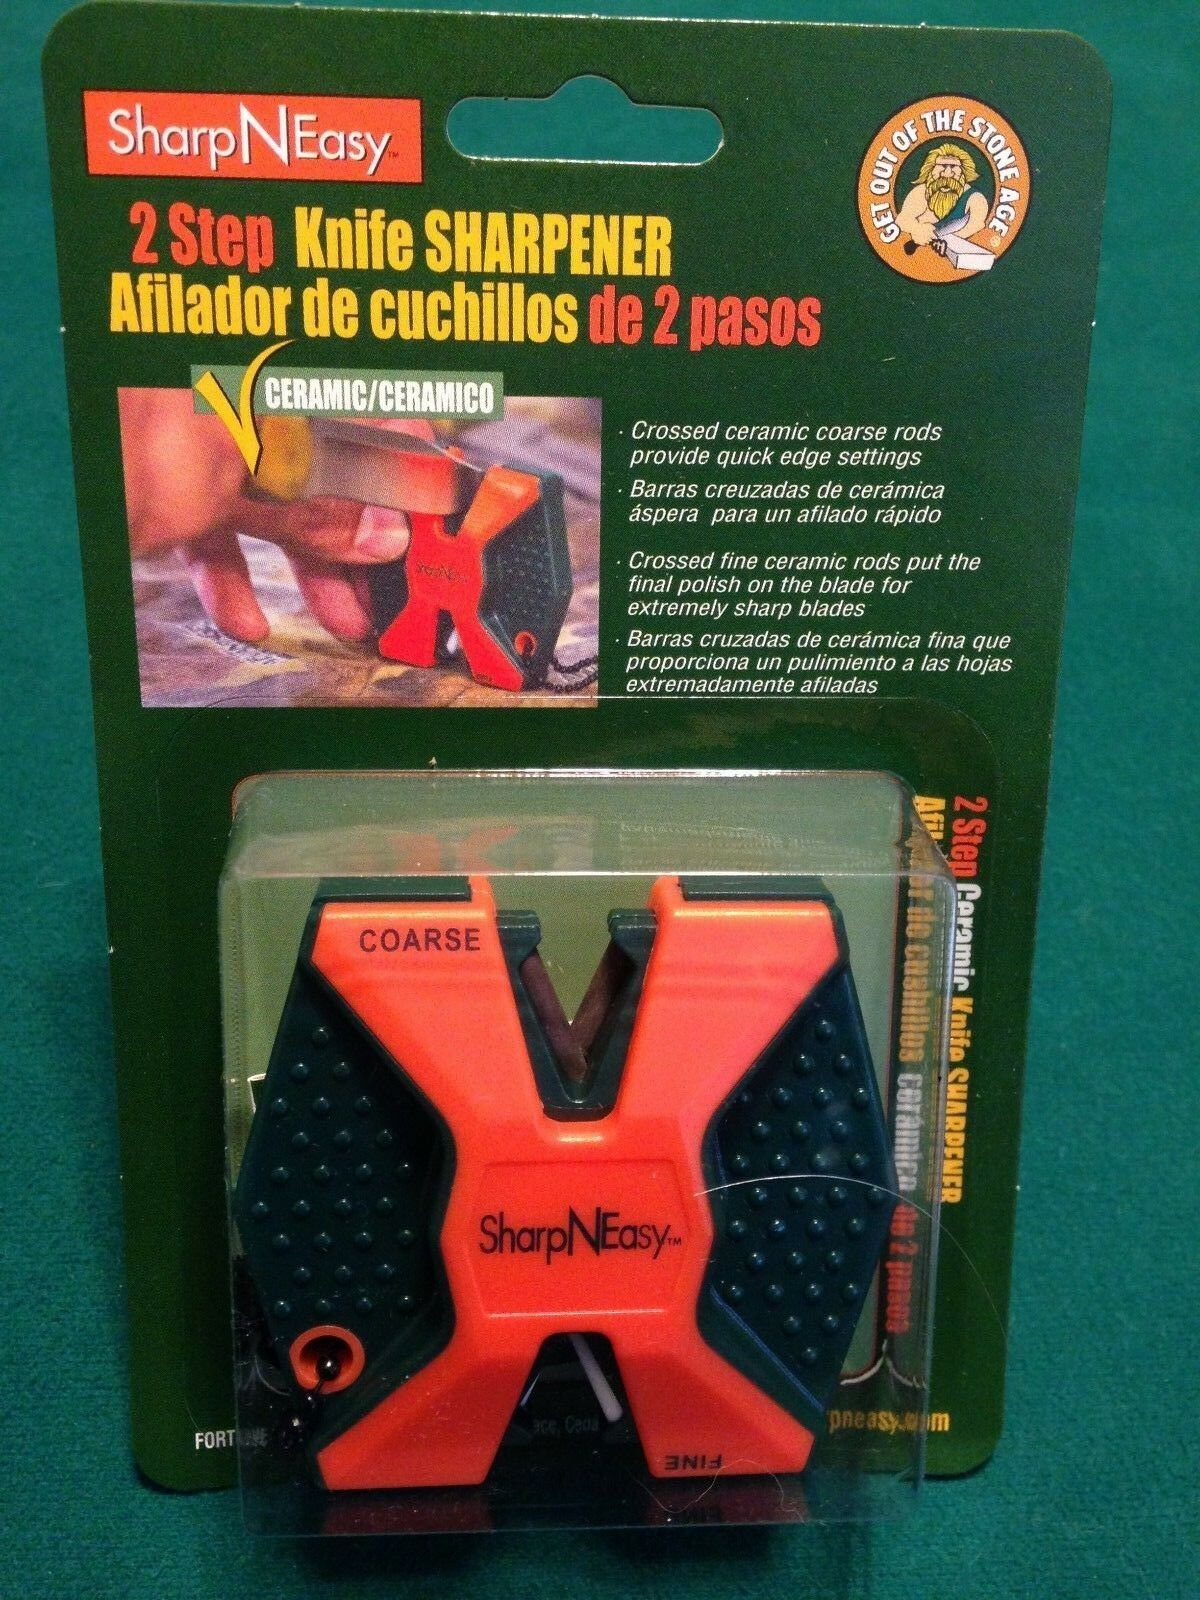 AccuSharp Model 336C, Sharp-N-Easy, Orange 336C